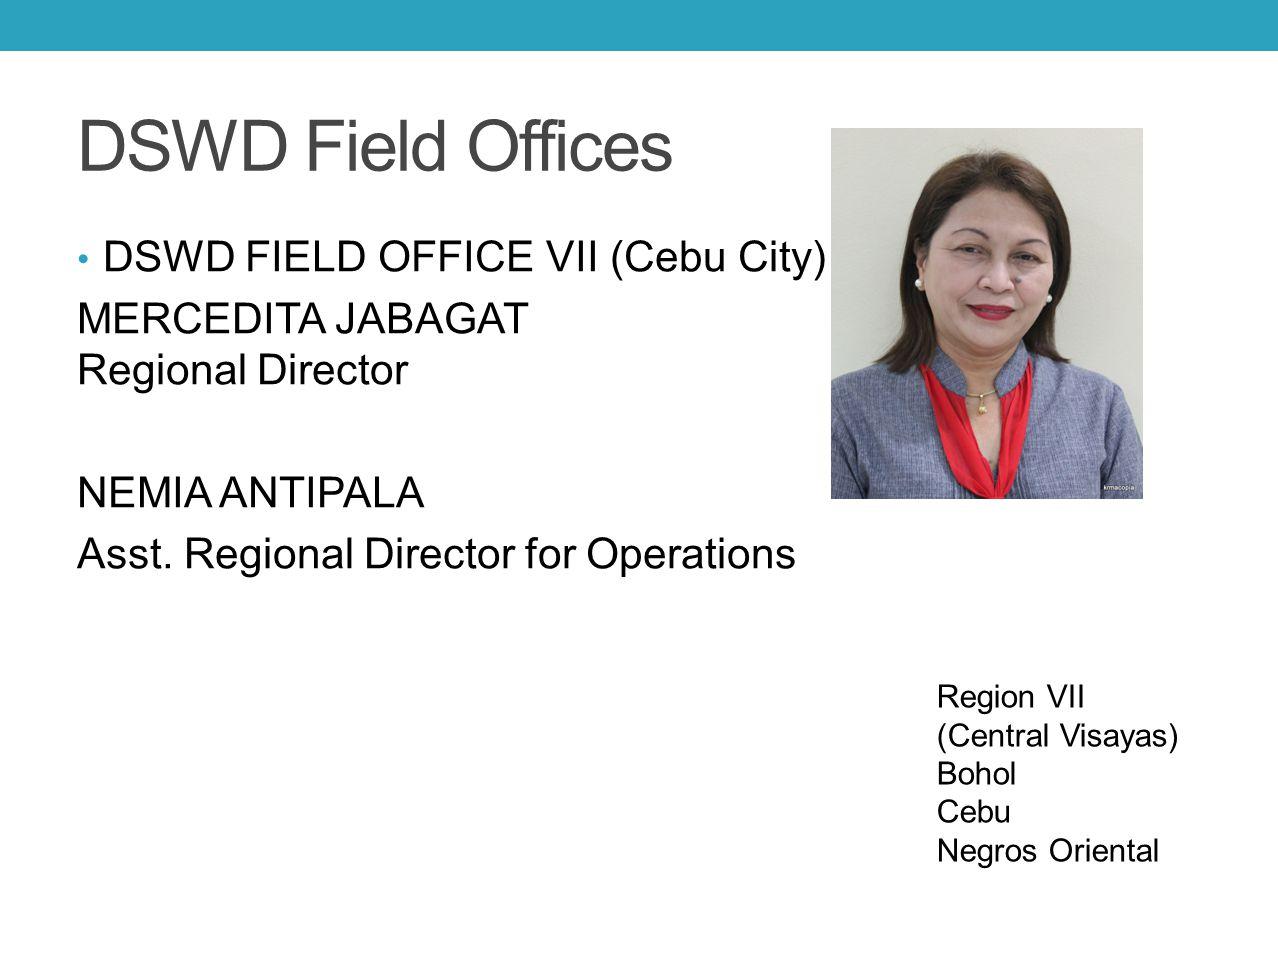 DSWD Field Offices DSWD FIELD OFFICE VII (Cebu City) MERCEDITA JABAGAT Regional Director NEMIA ANTIPALA Asst. Regional Director for Operations Region